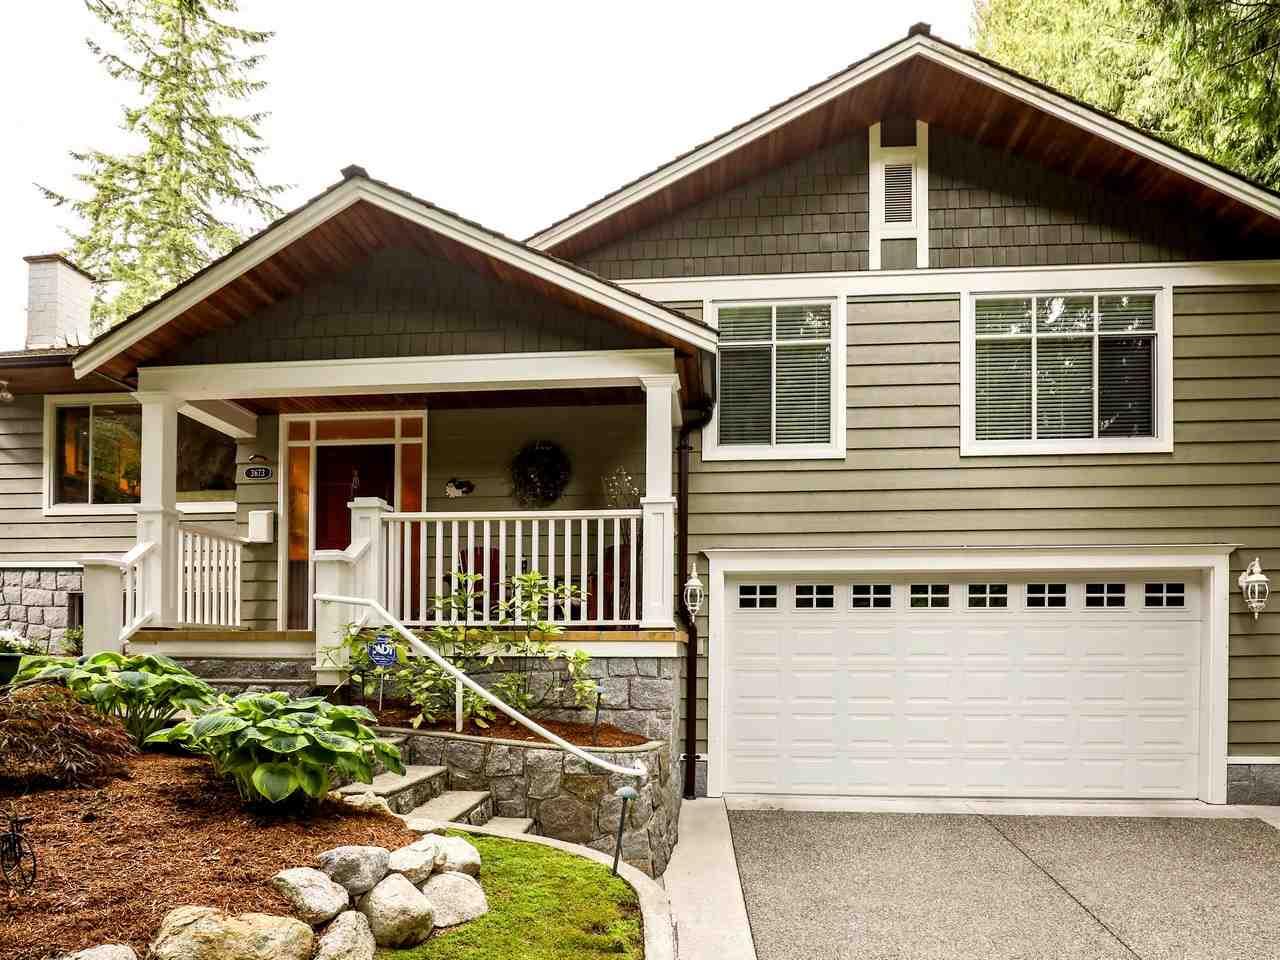 3673 PRINCESS AVENUE, North Vancouver, BC V7N 2E4